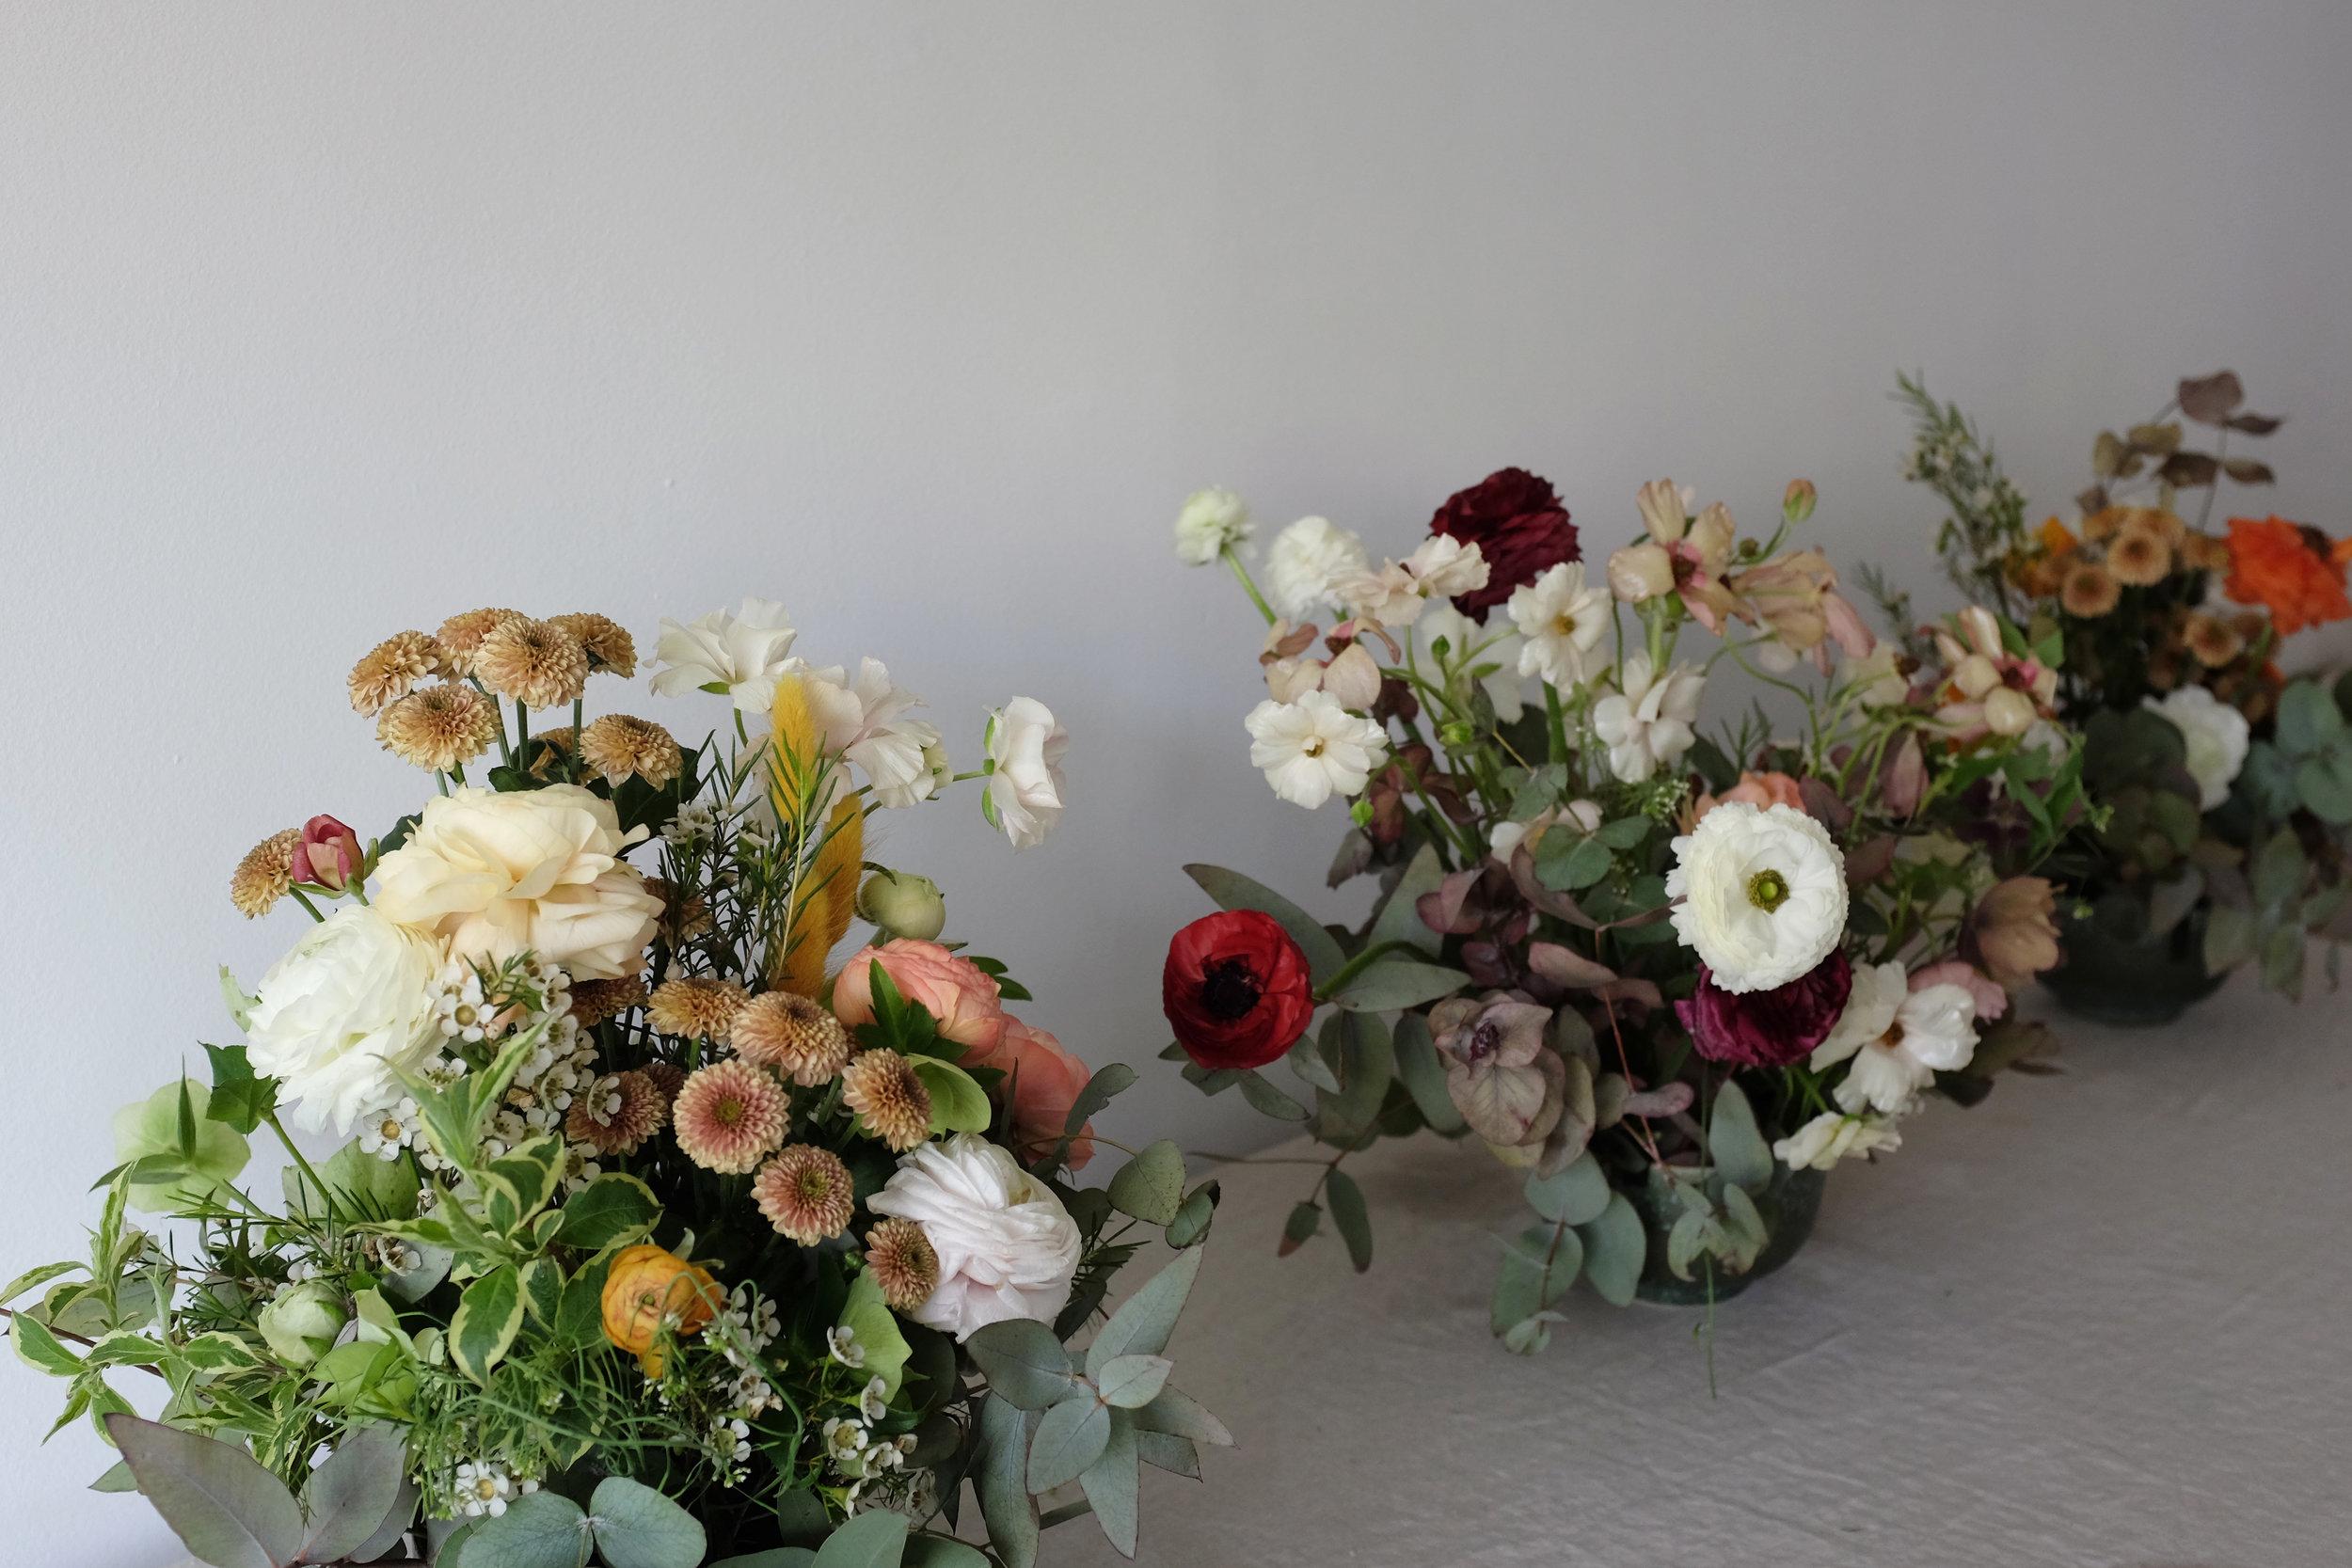 flower_arranging10.jpg